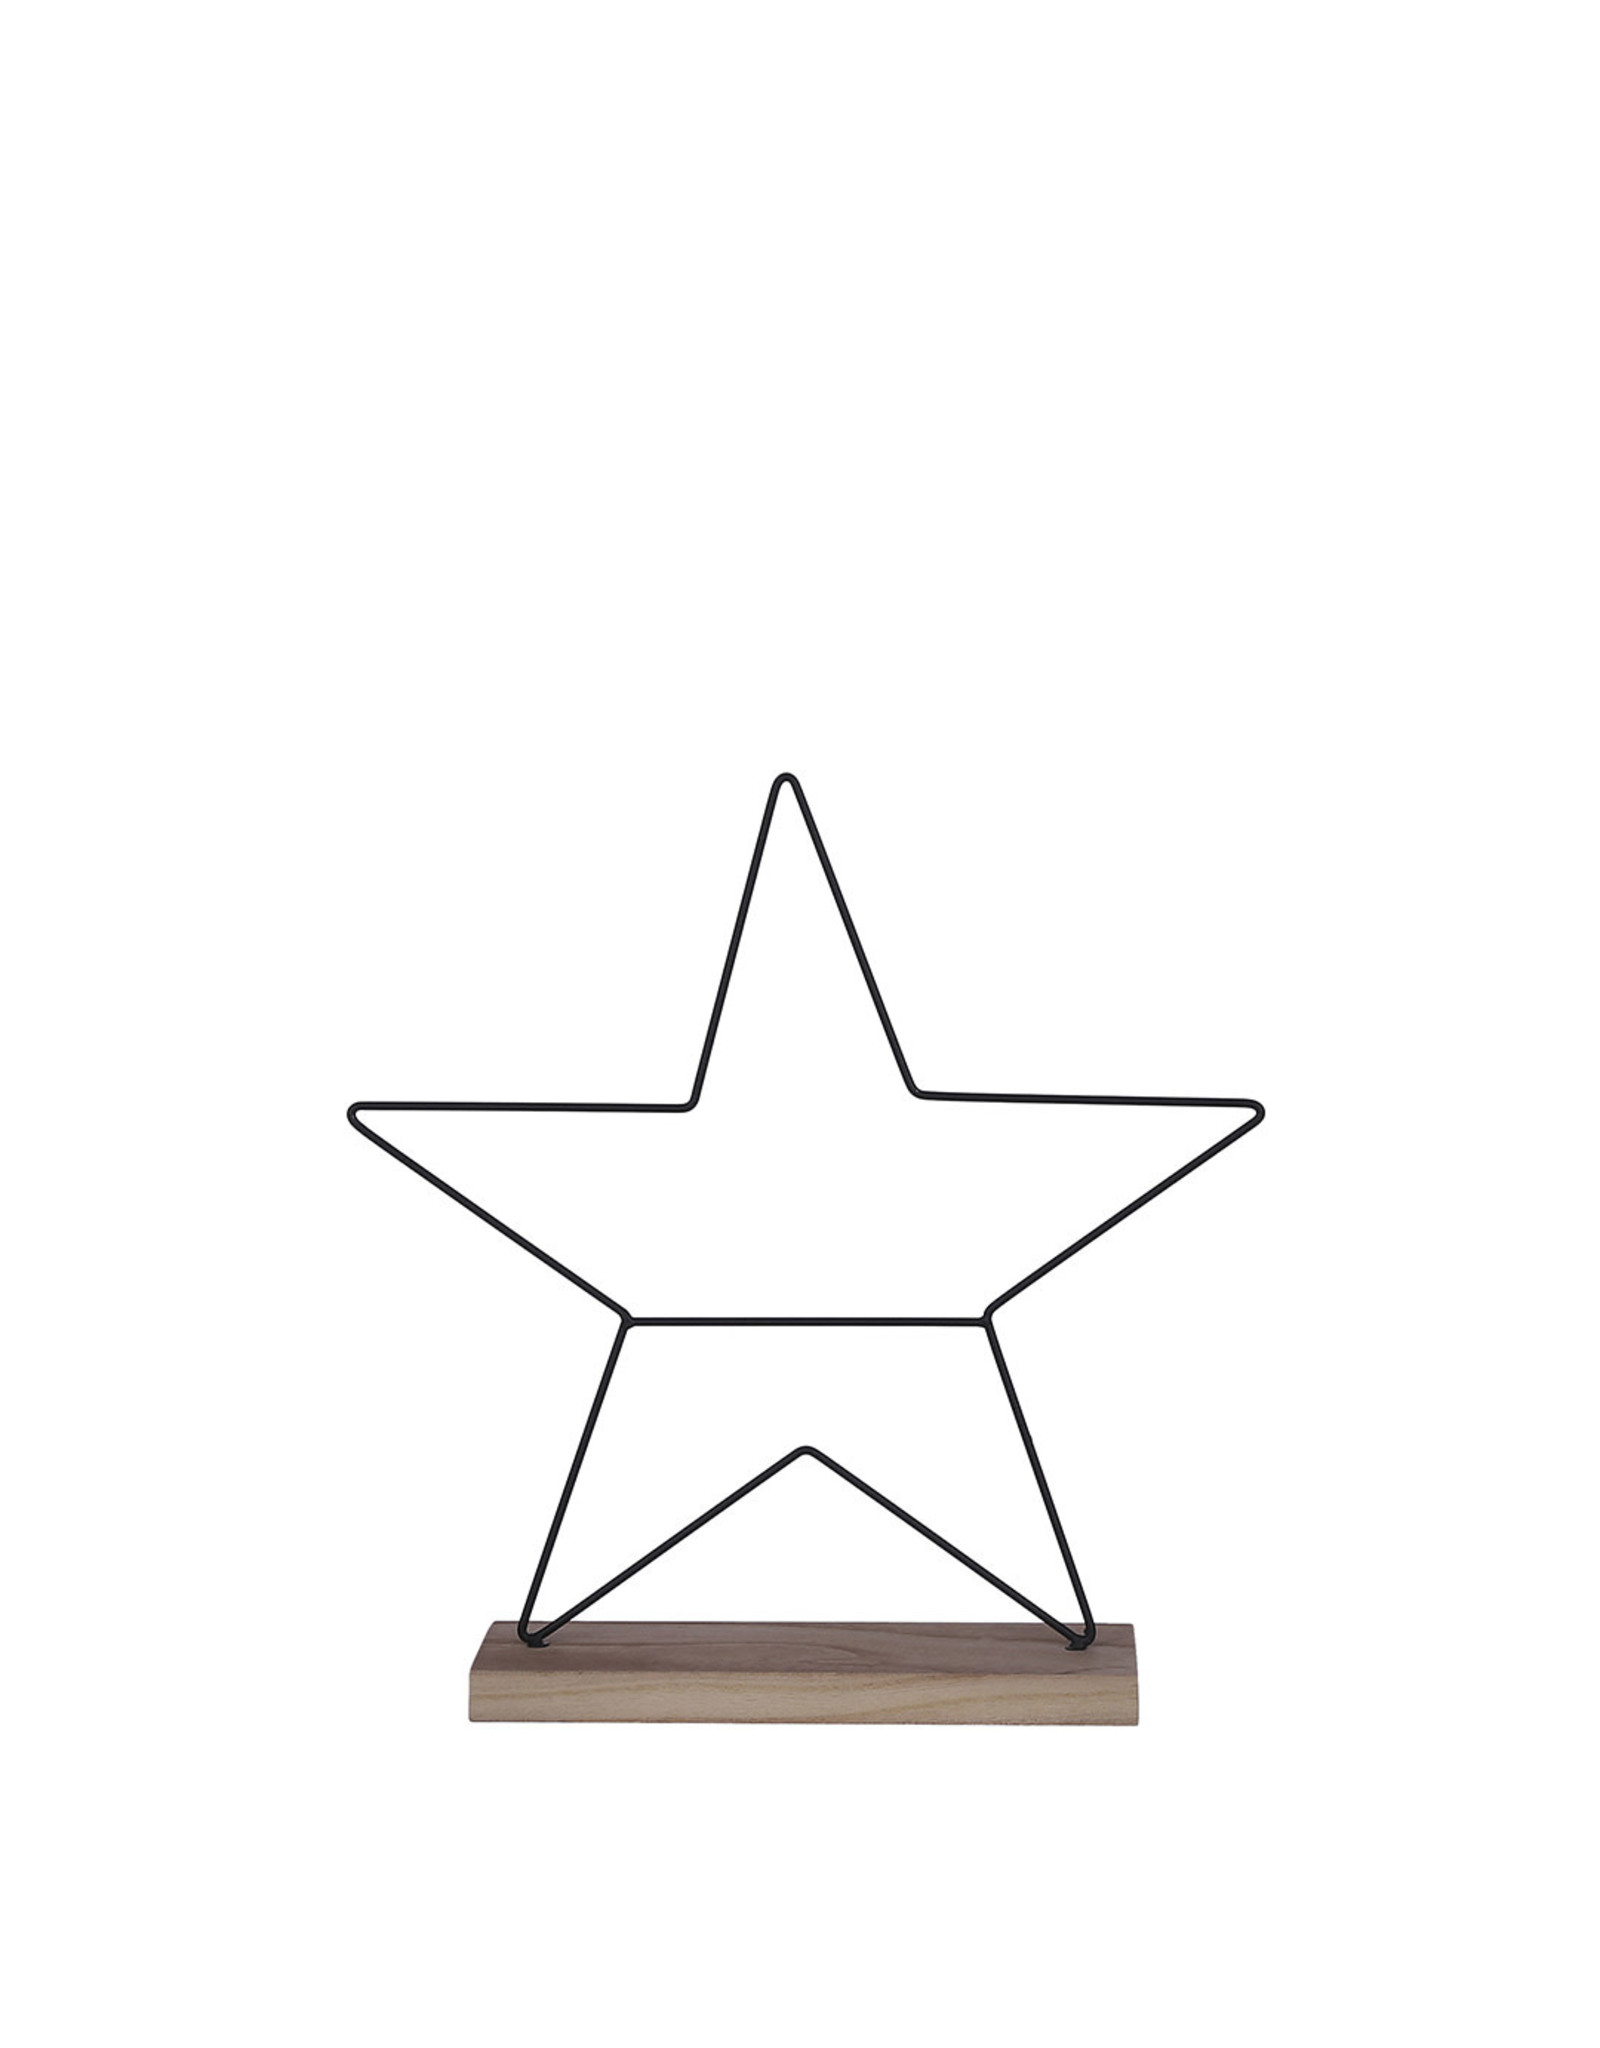 Decoration star black - w8xd38cm